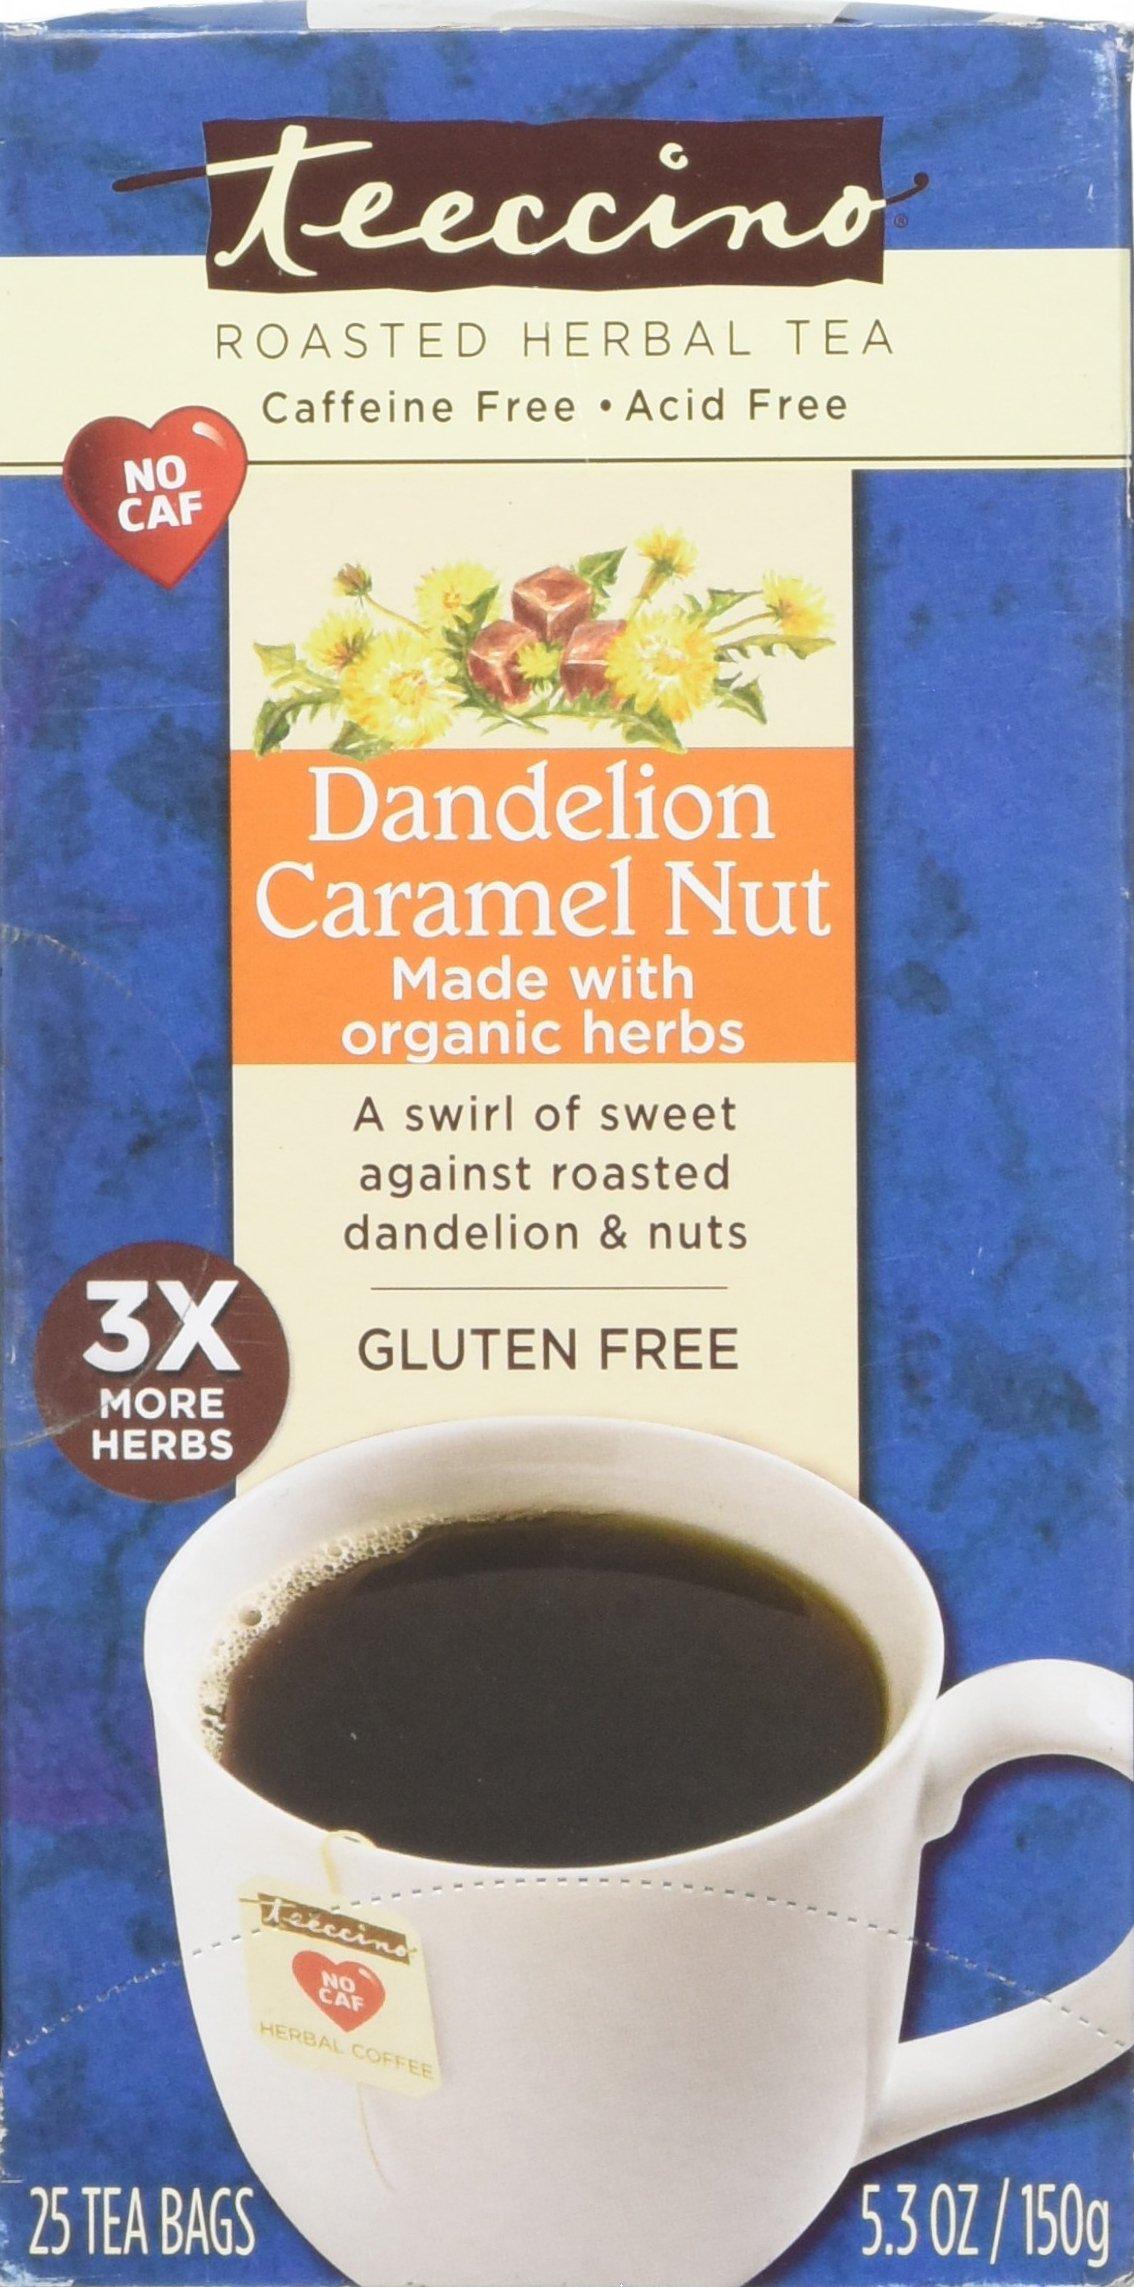 Teeccino Dandelion Caramel Nut Chicory Herbal Tea Bags, Gluten Free, Caffeine Free, Acid Free, 25 Count